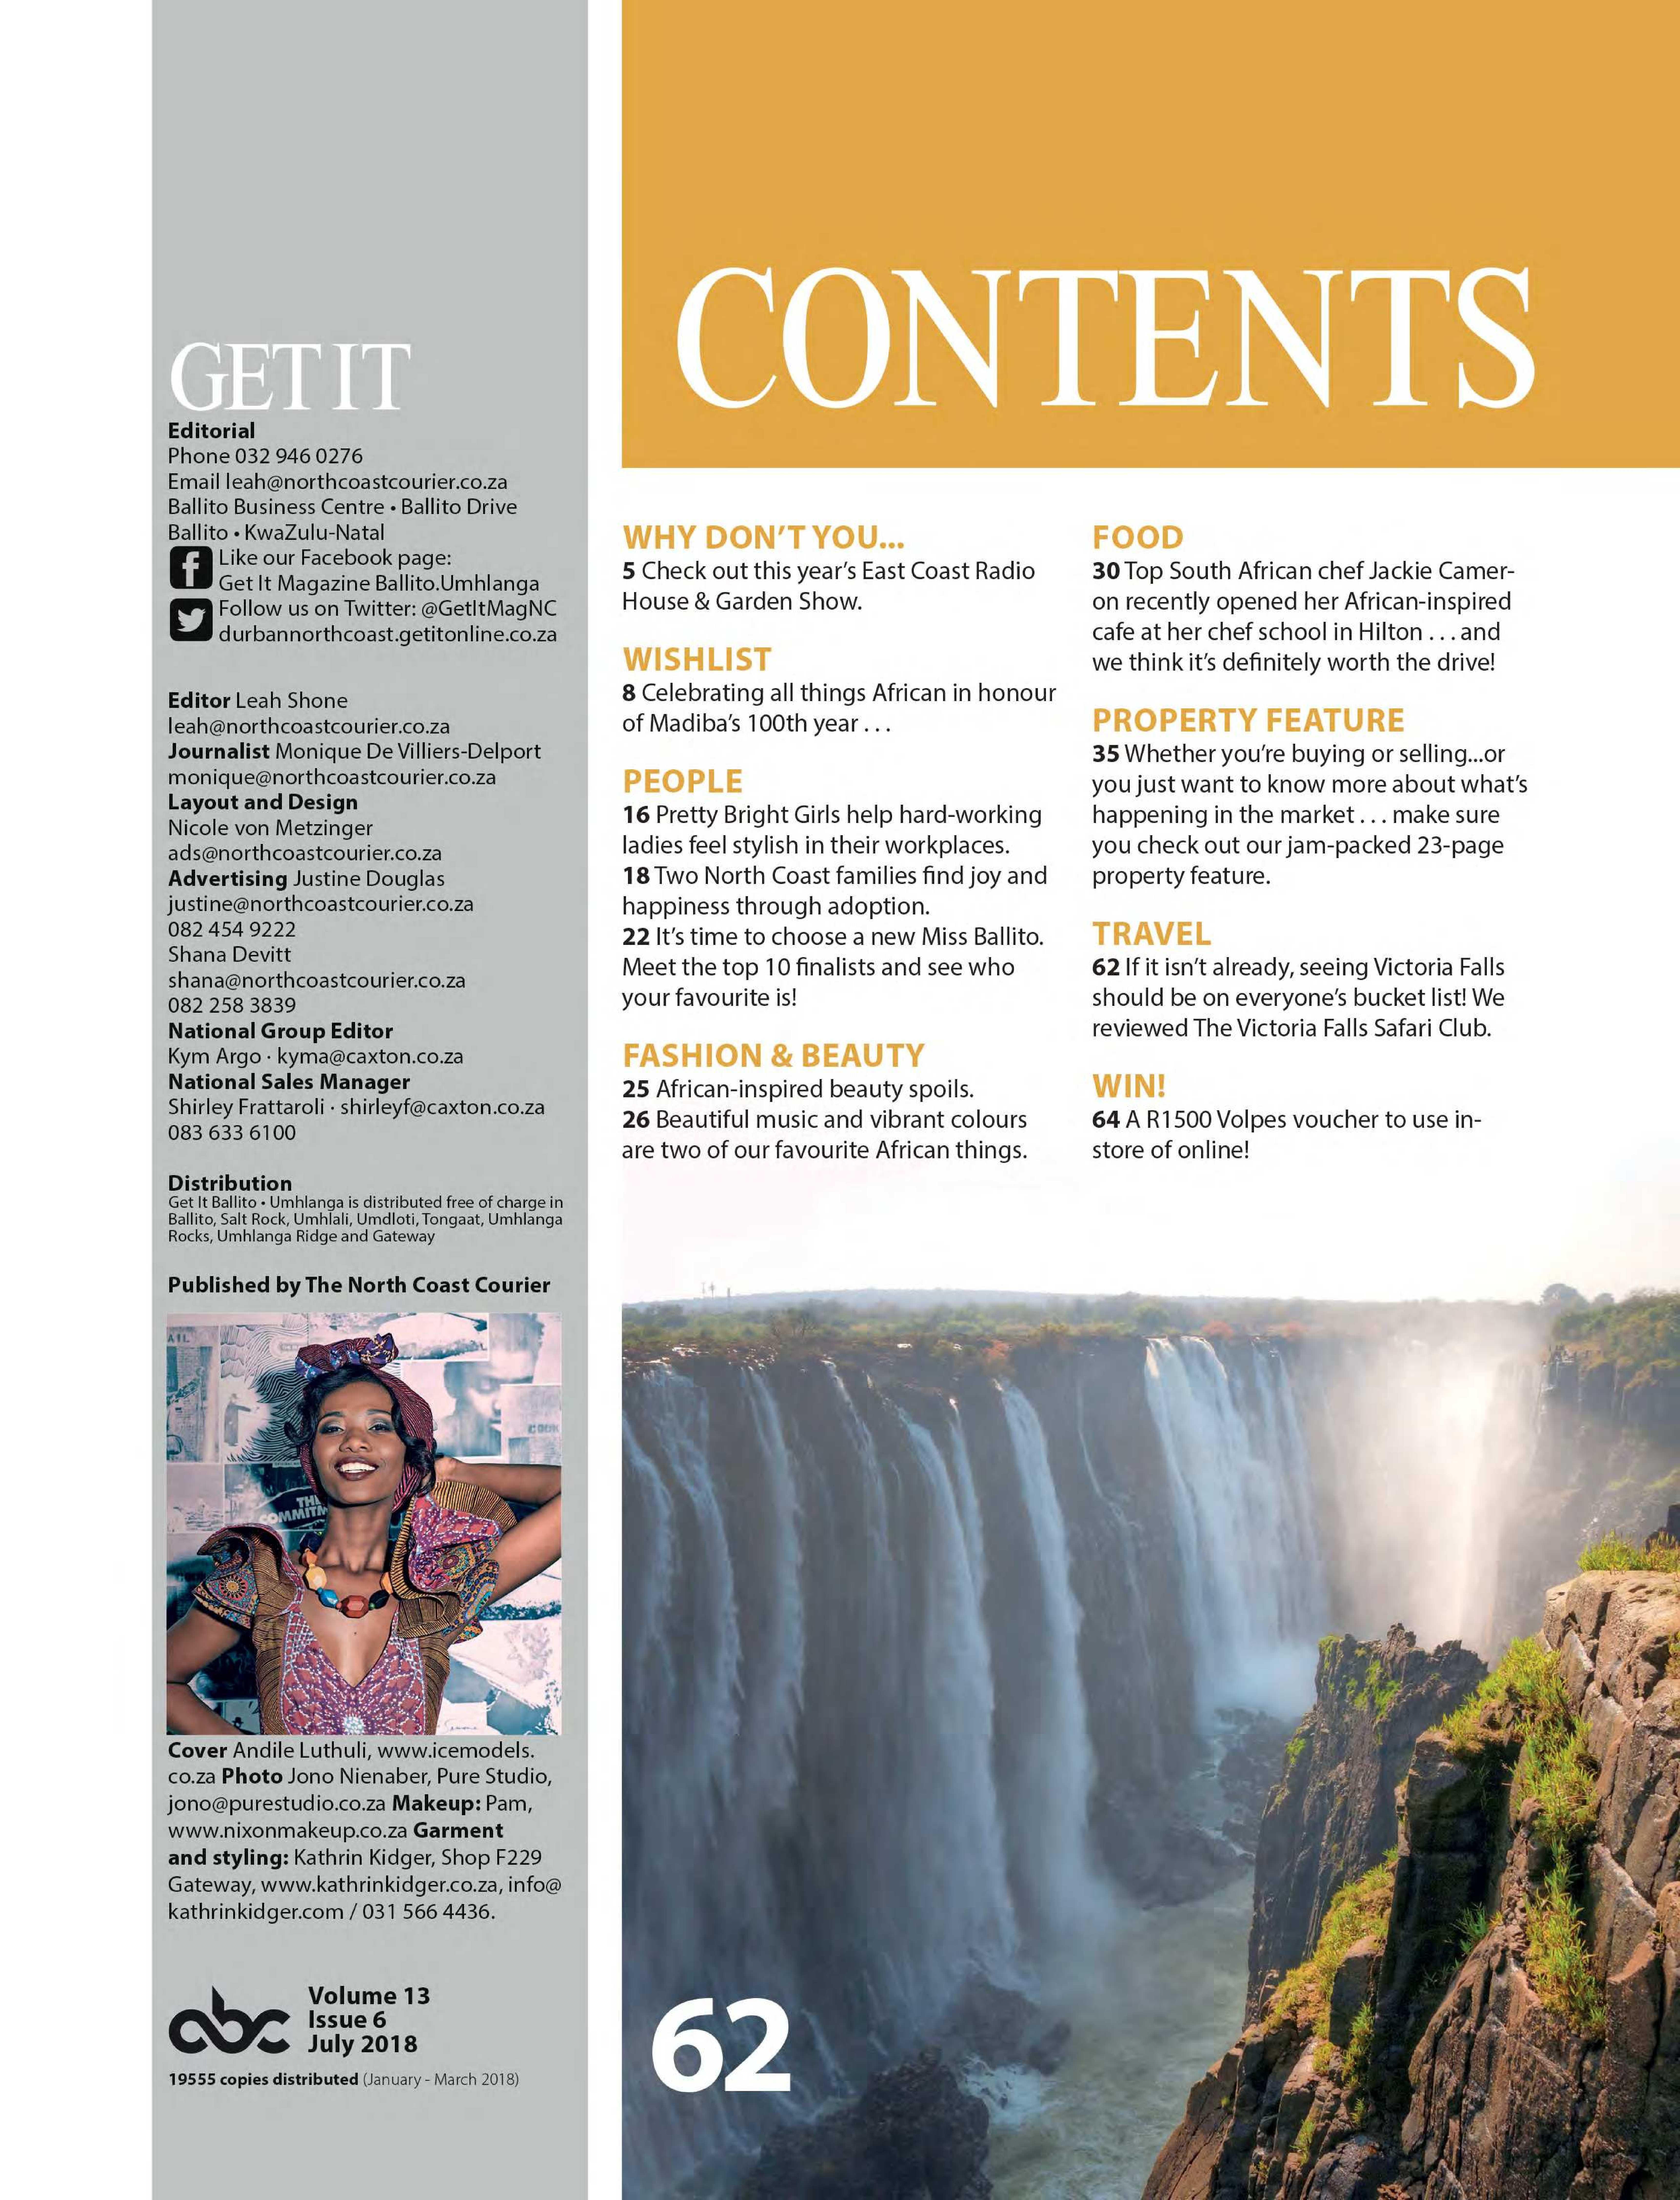 get-magazine-ballitoumhlanga-july-2018-epapers-page-5